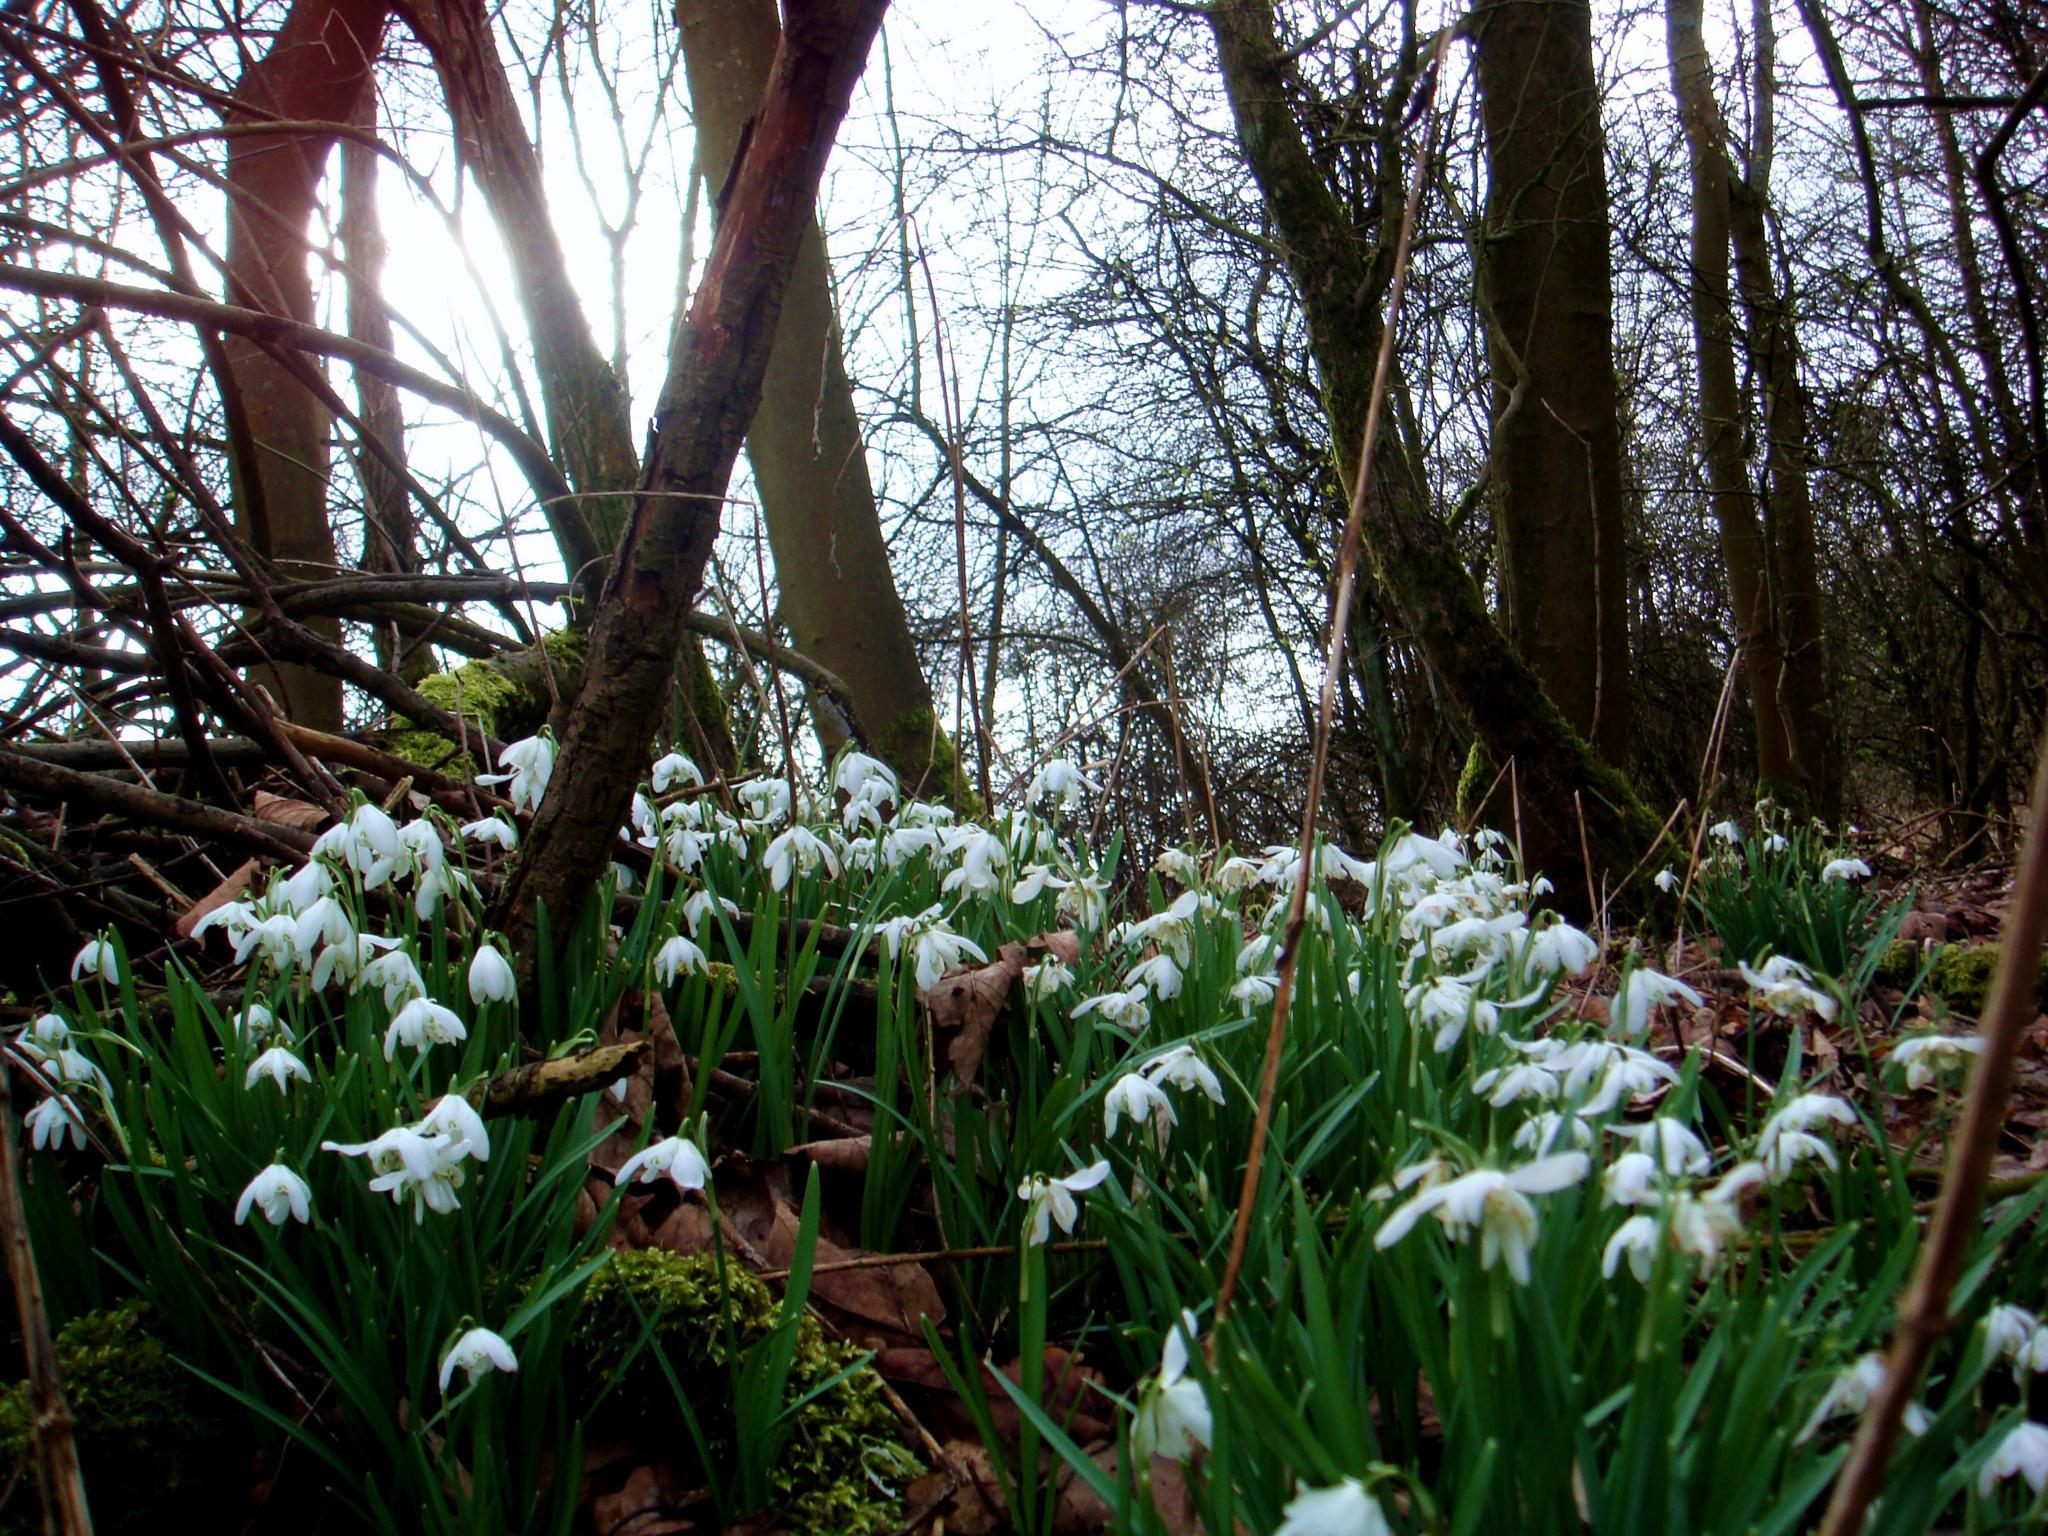 Snowdrops by William O'Mahony